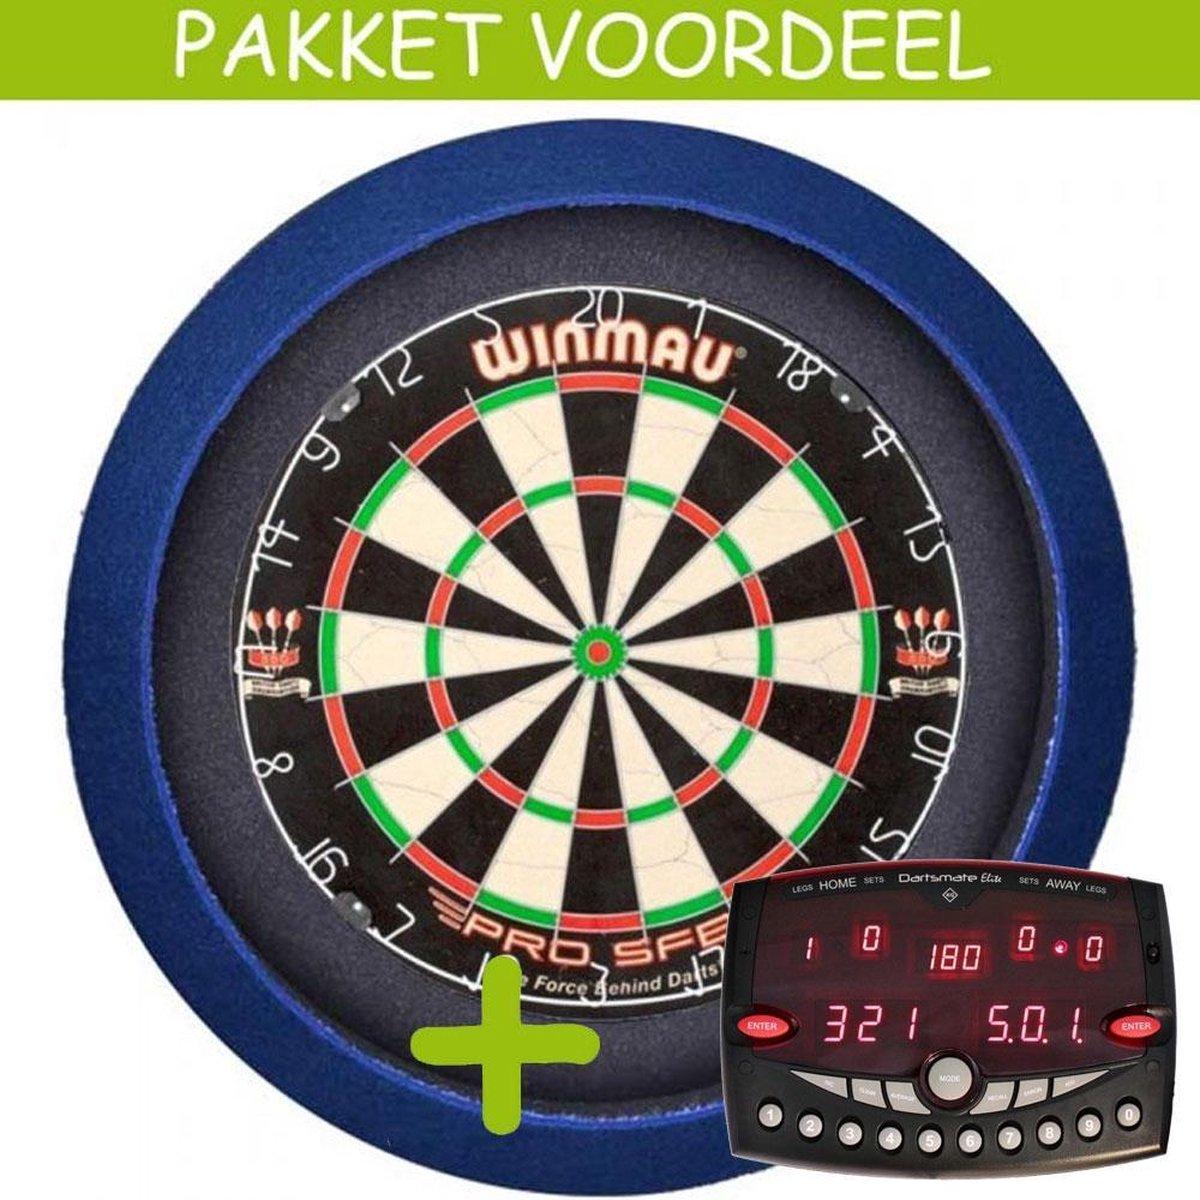 Elektronisch Dart Scorebord VoordeelPakket (Elite ) - Pro SFB - Dartbordverlichting Basic (Blauw)